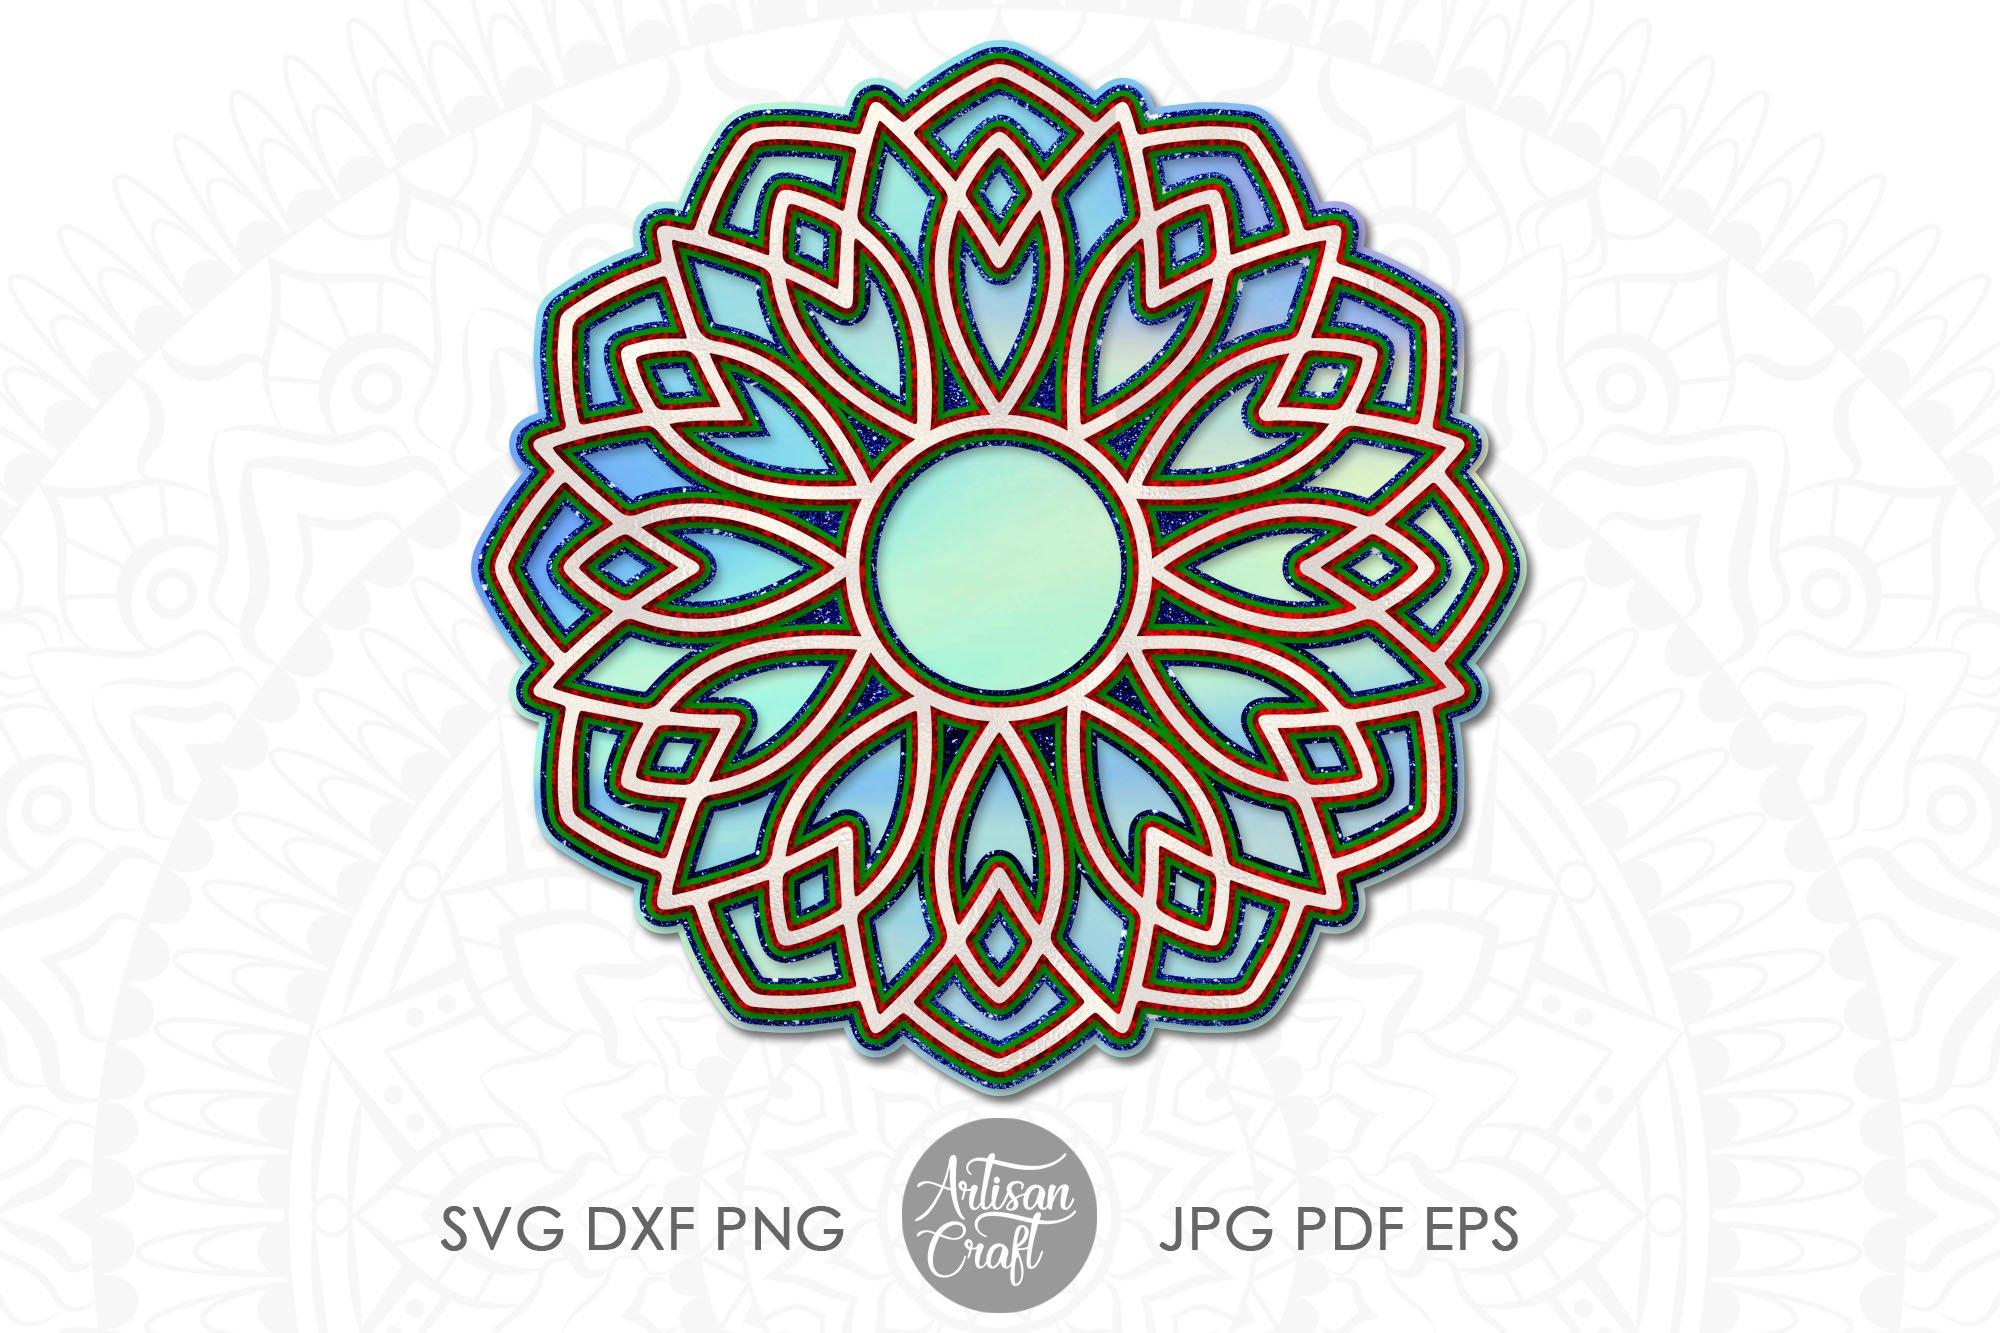 Download 3d Layered Mandala Svg 3d Paper Sculpture Layered Vinyl 857430 Cut Files Design Bundles